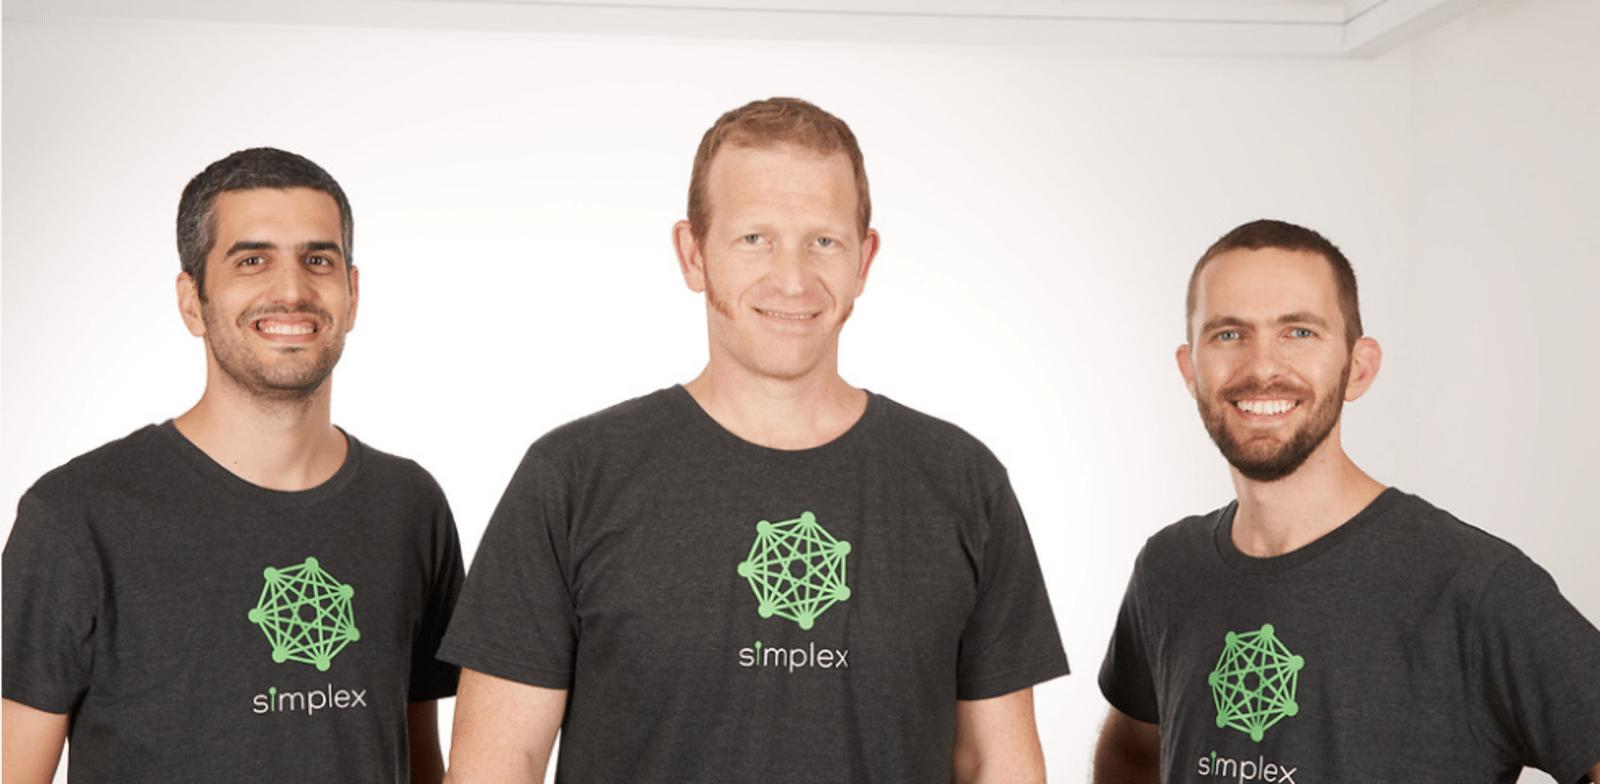 Simplex founders Credit: PR